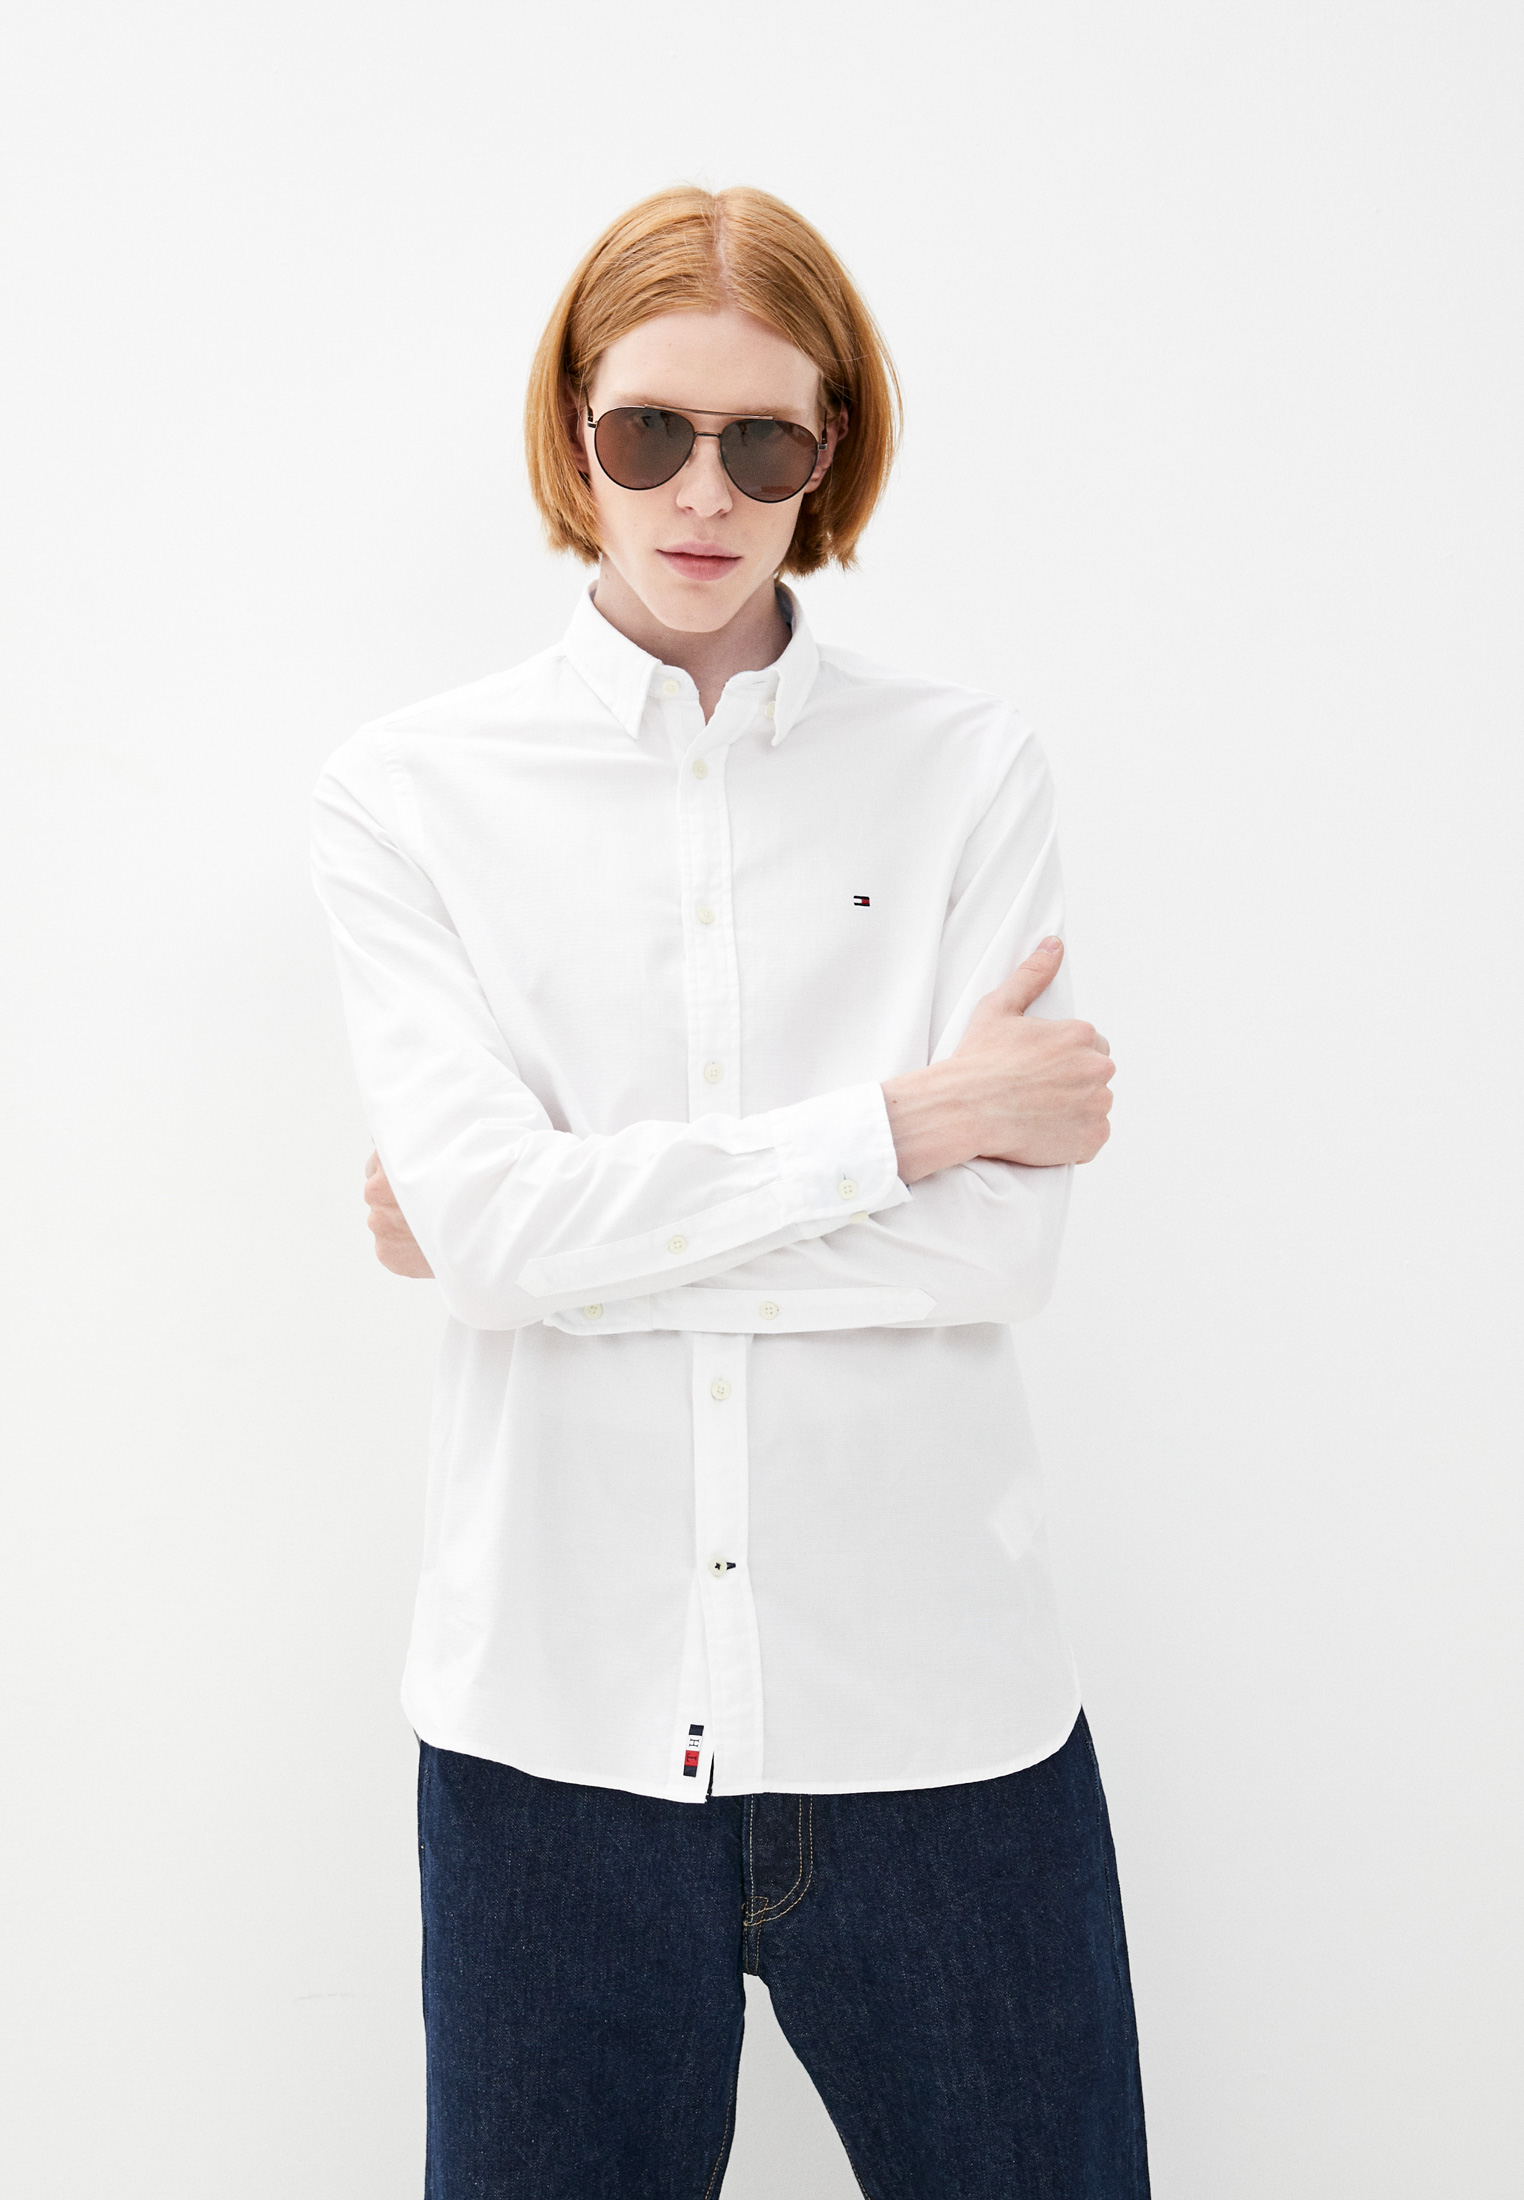 Рубашка с длинным рукавом Tommy Hilfiger (Томми Хилфигер) MW0MW18878